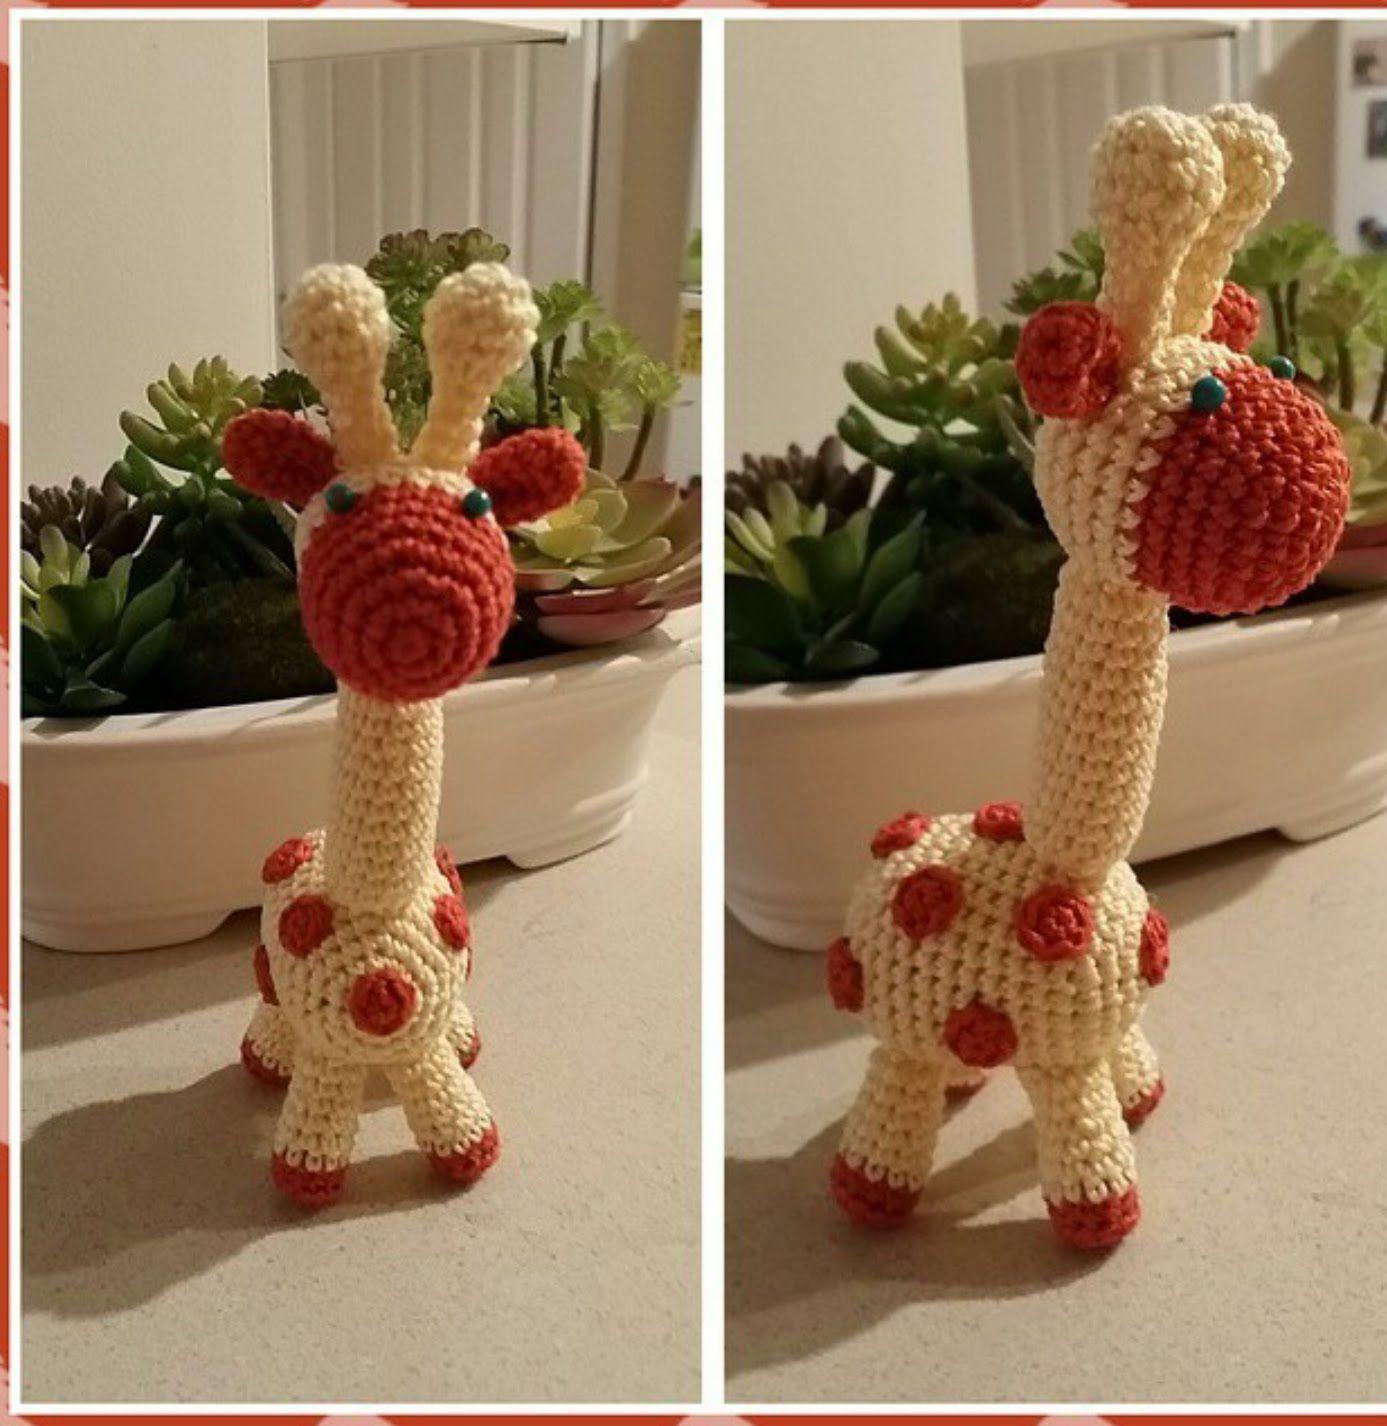 вязание крючком игрушки жираф мастер класс куклы вязание